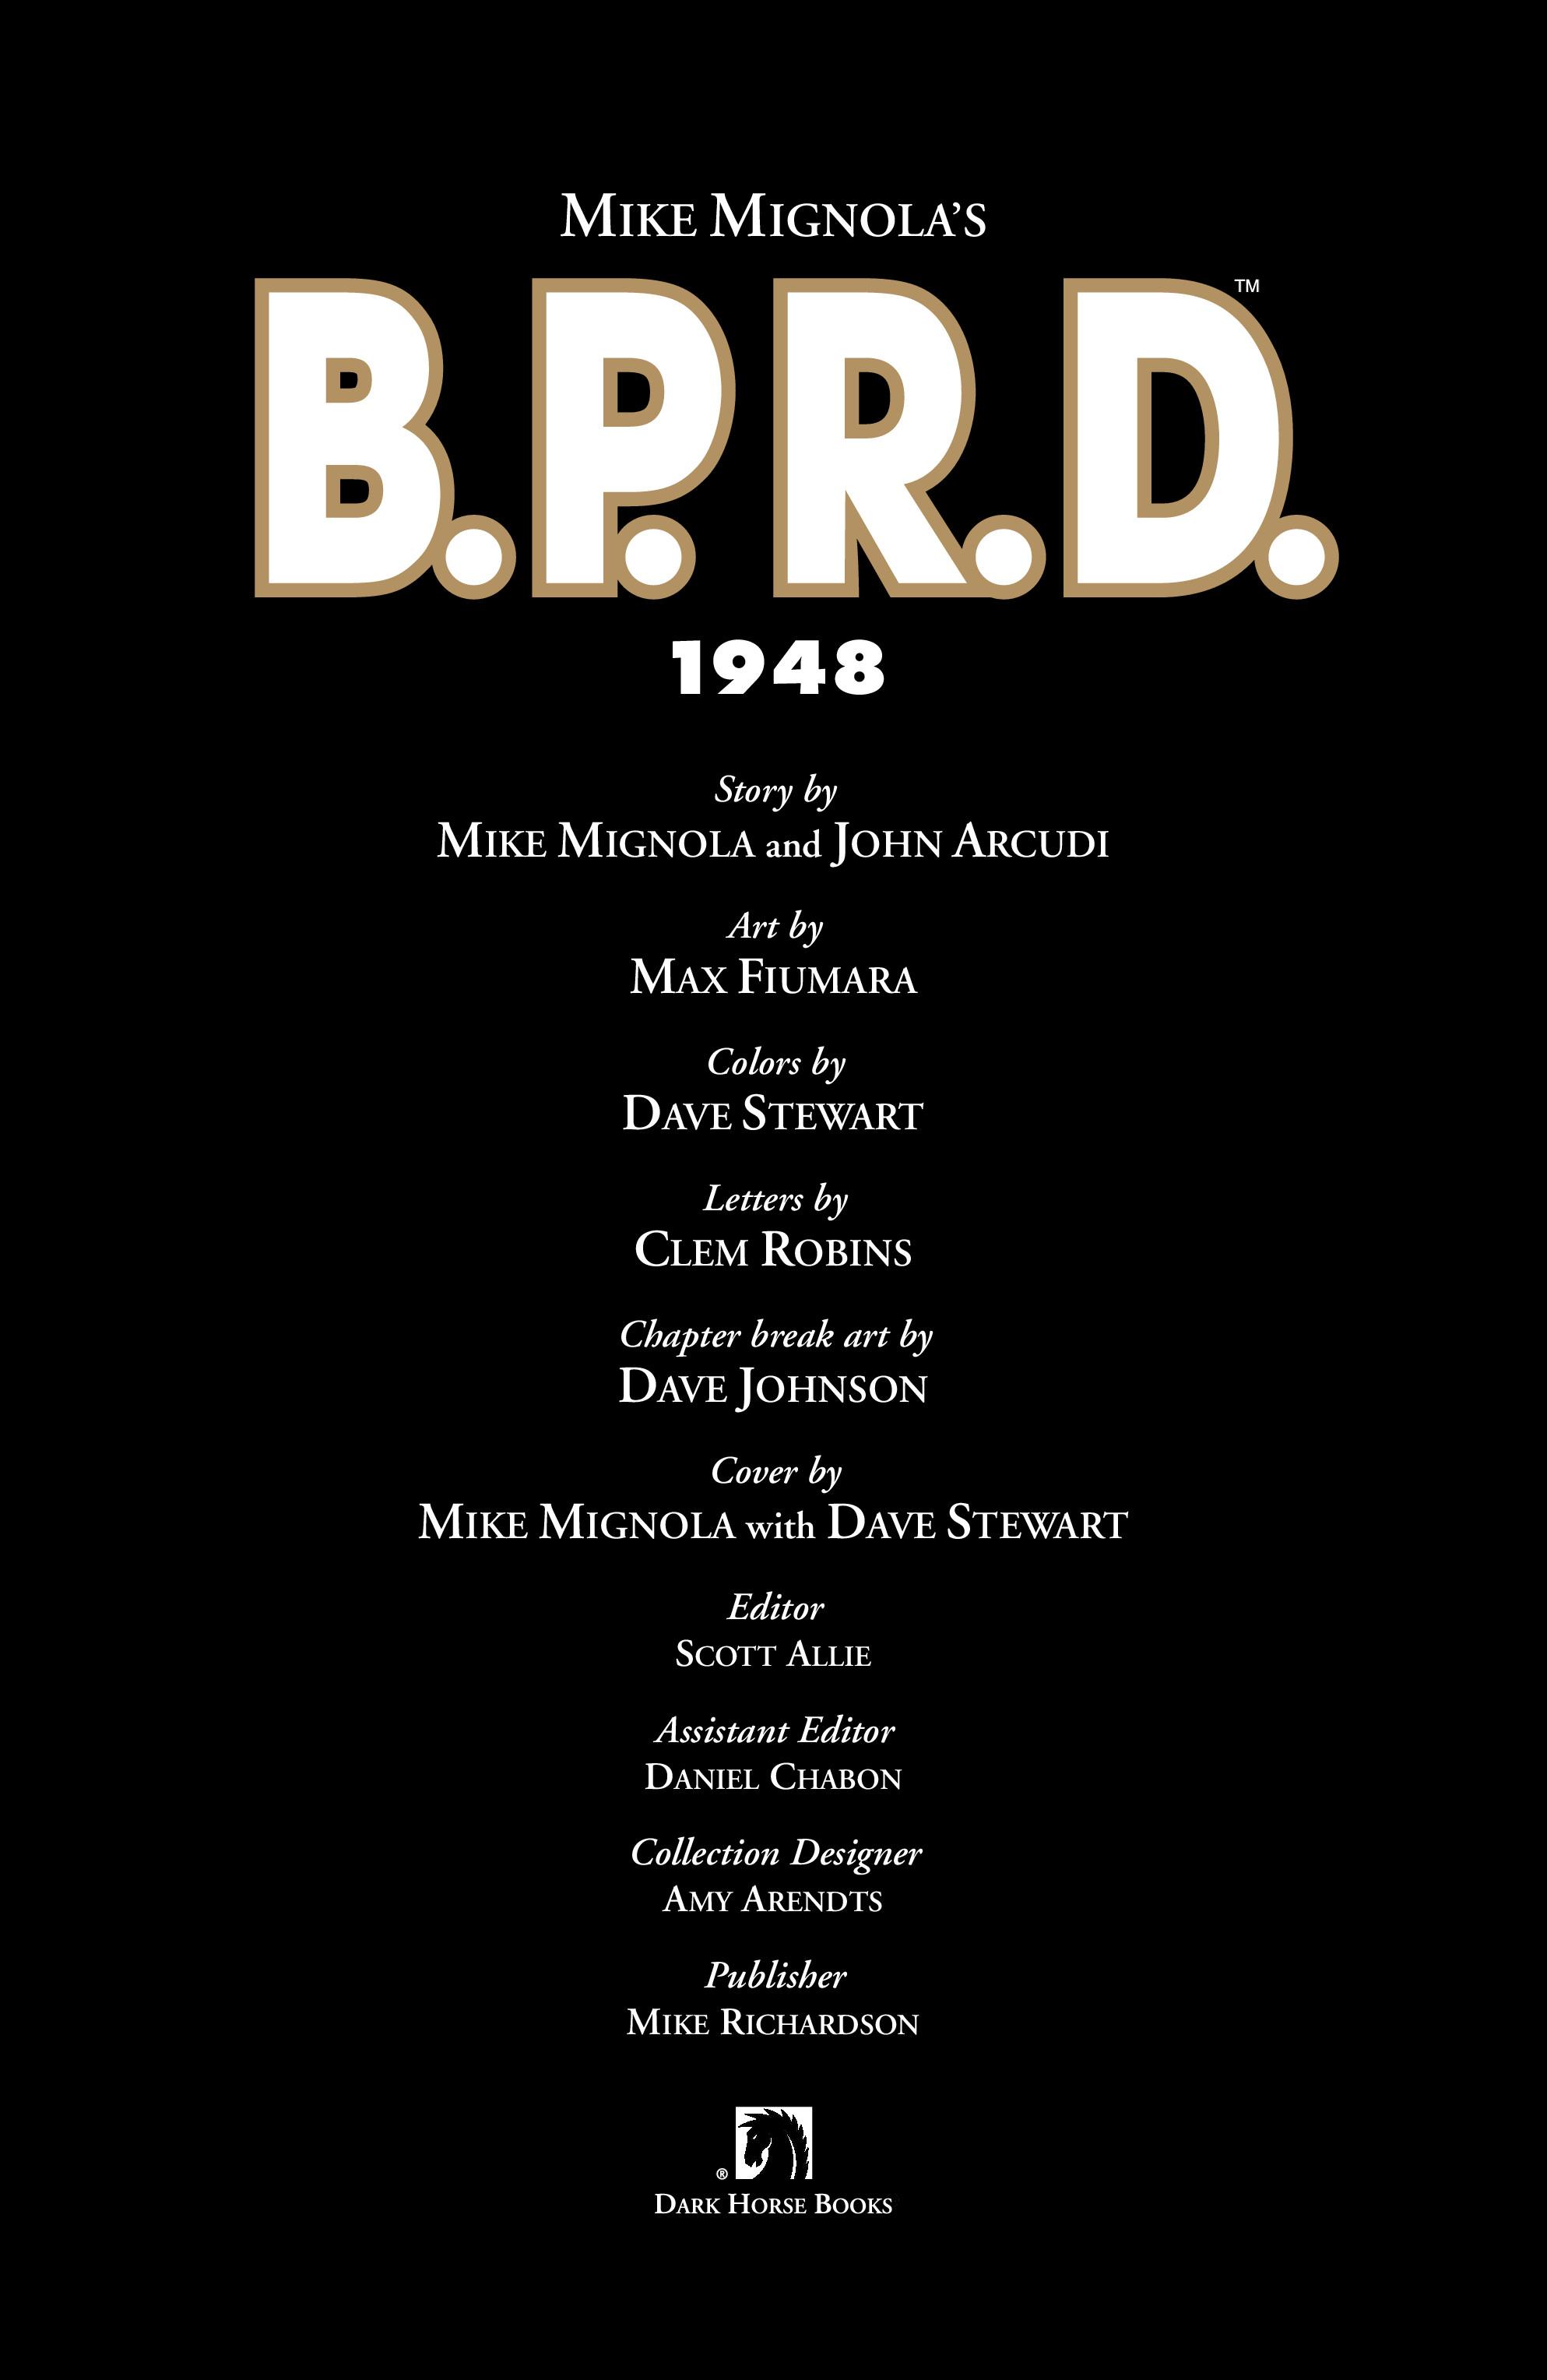 Read online B.P.R.D.: 1948 comic -  Issue # TPB - 5